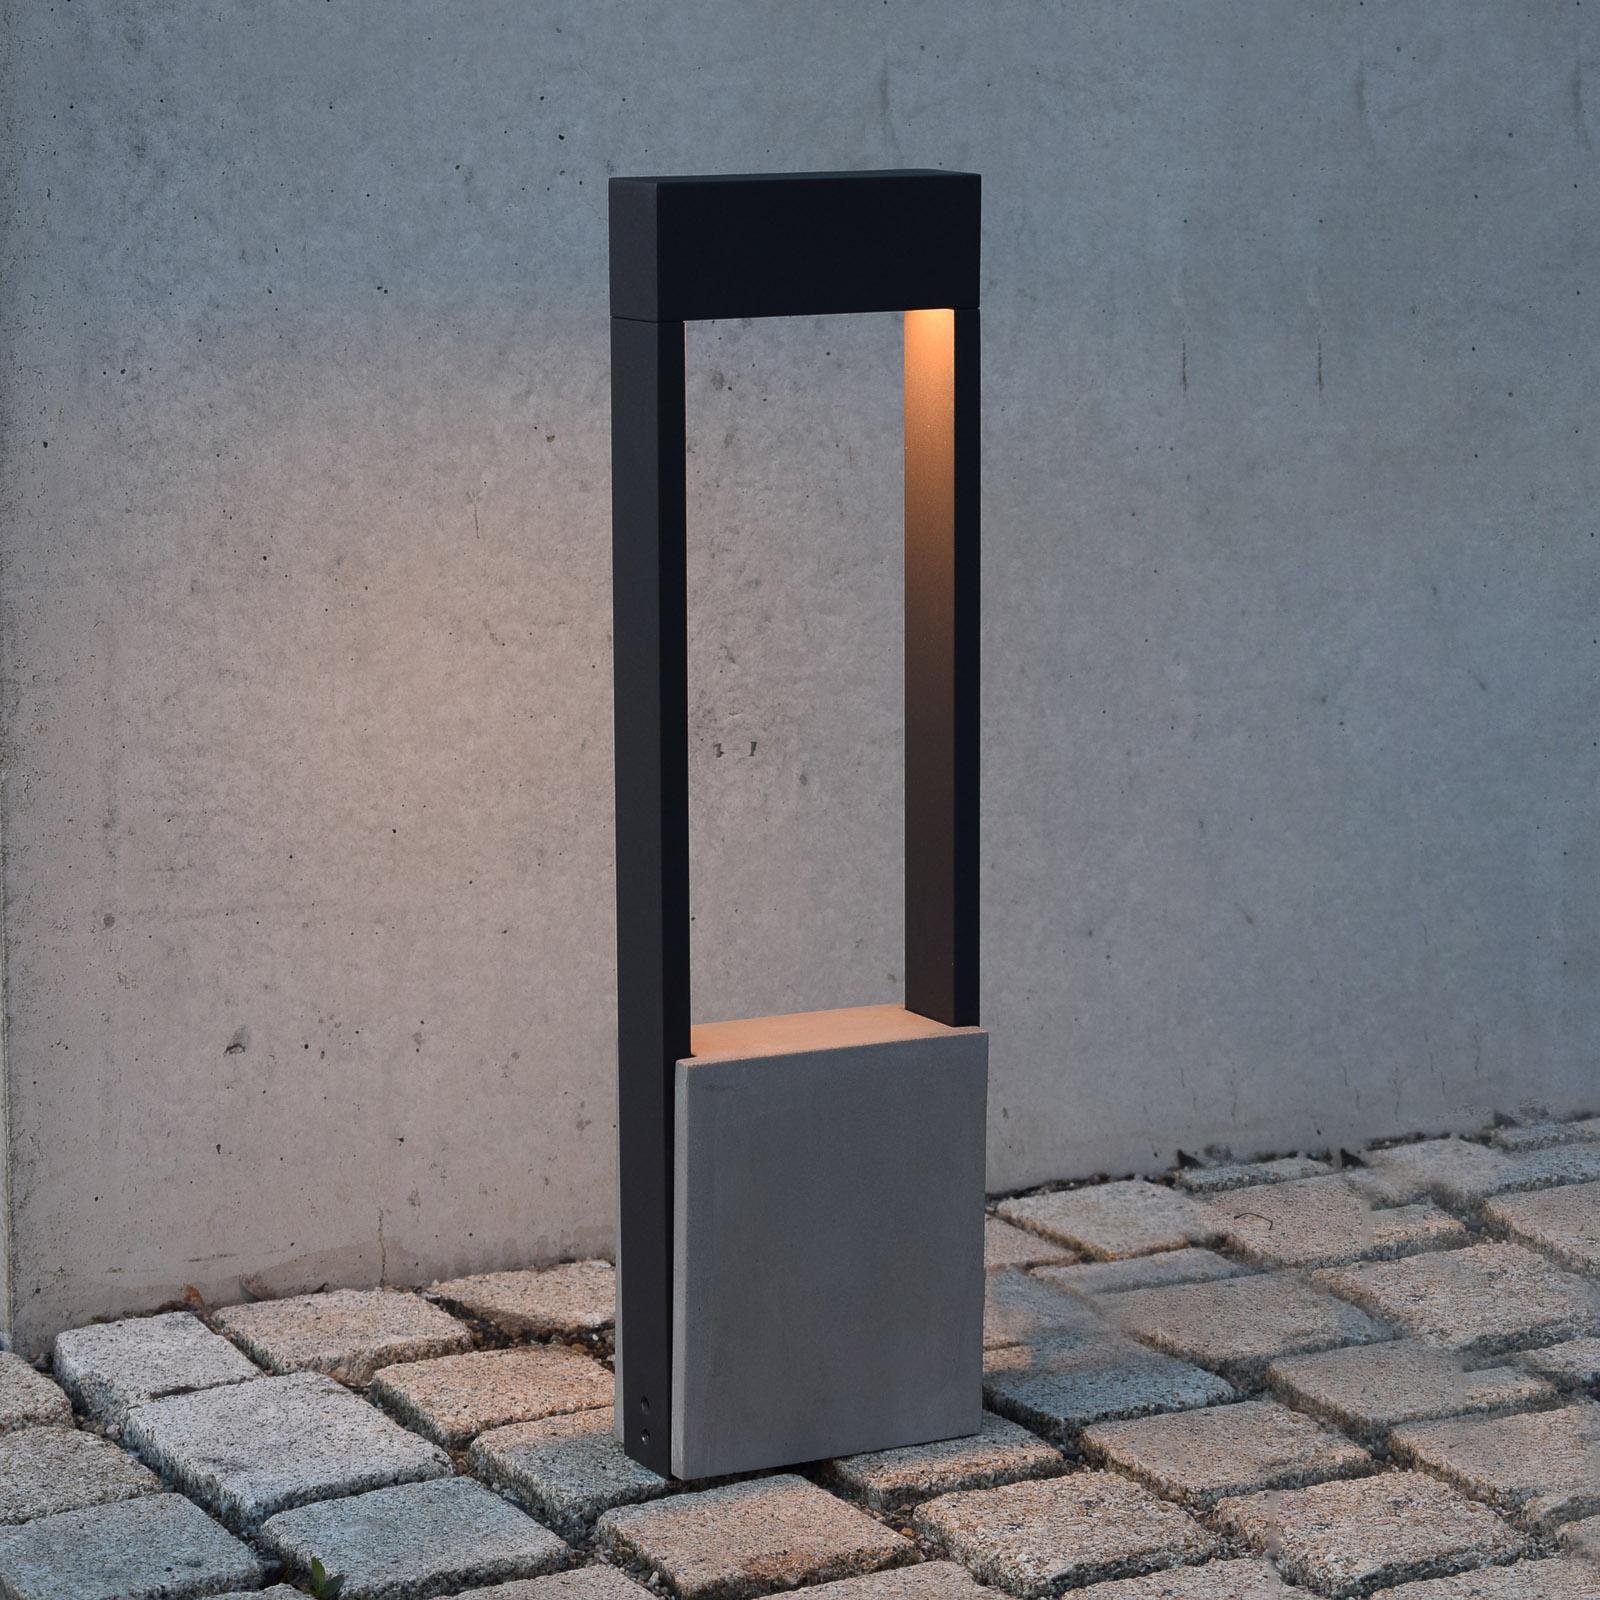 LED-Wegeleuchte Chertan, Betonelement, Höhe 60 cm